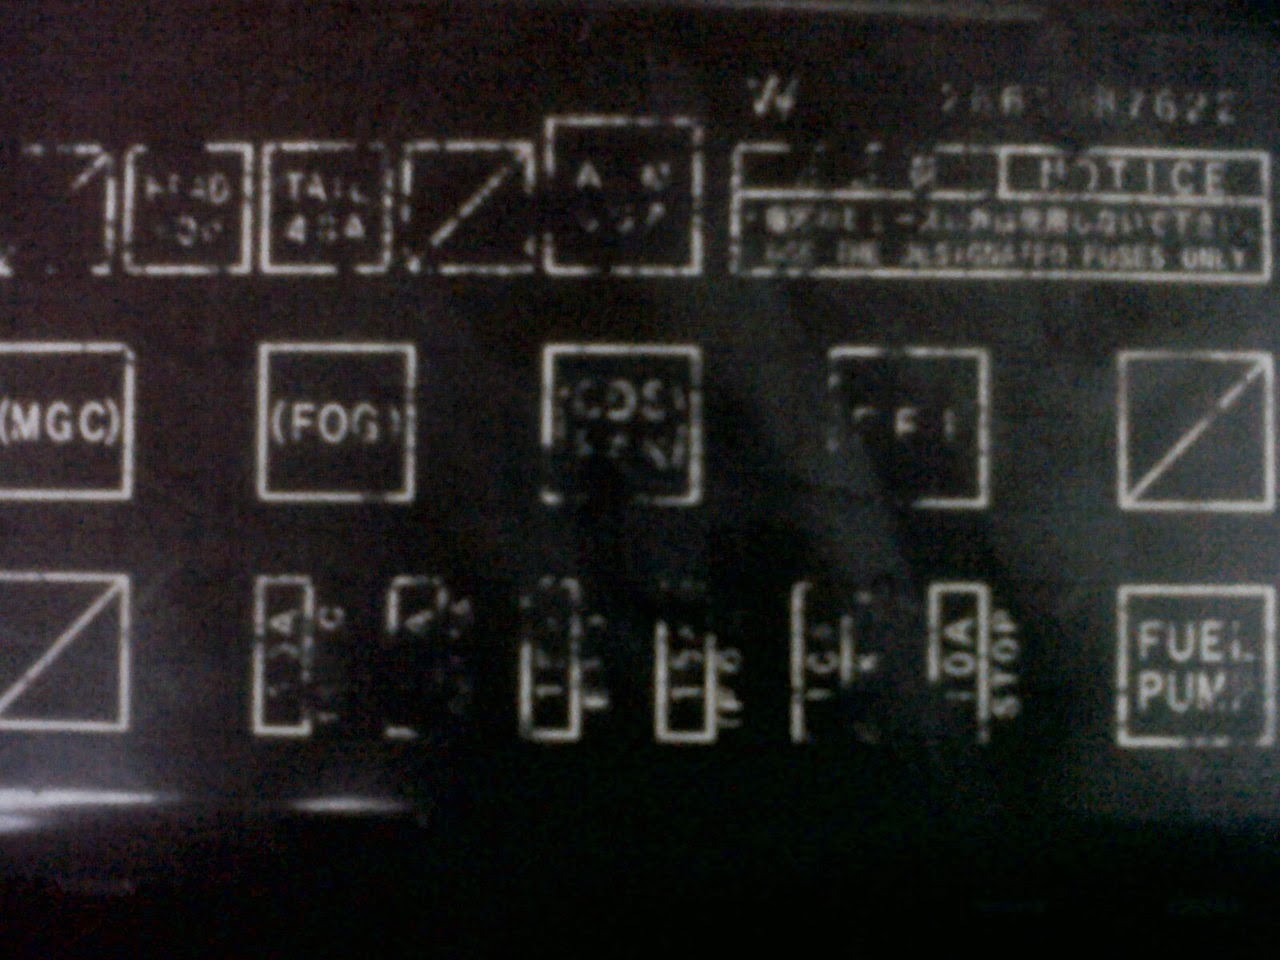 small resolution of fuse box daihatsu taruna schematic diagramfuse box daihatsu taruna wiring diagram daihatsu wagon r fuse box